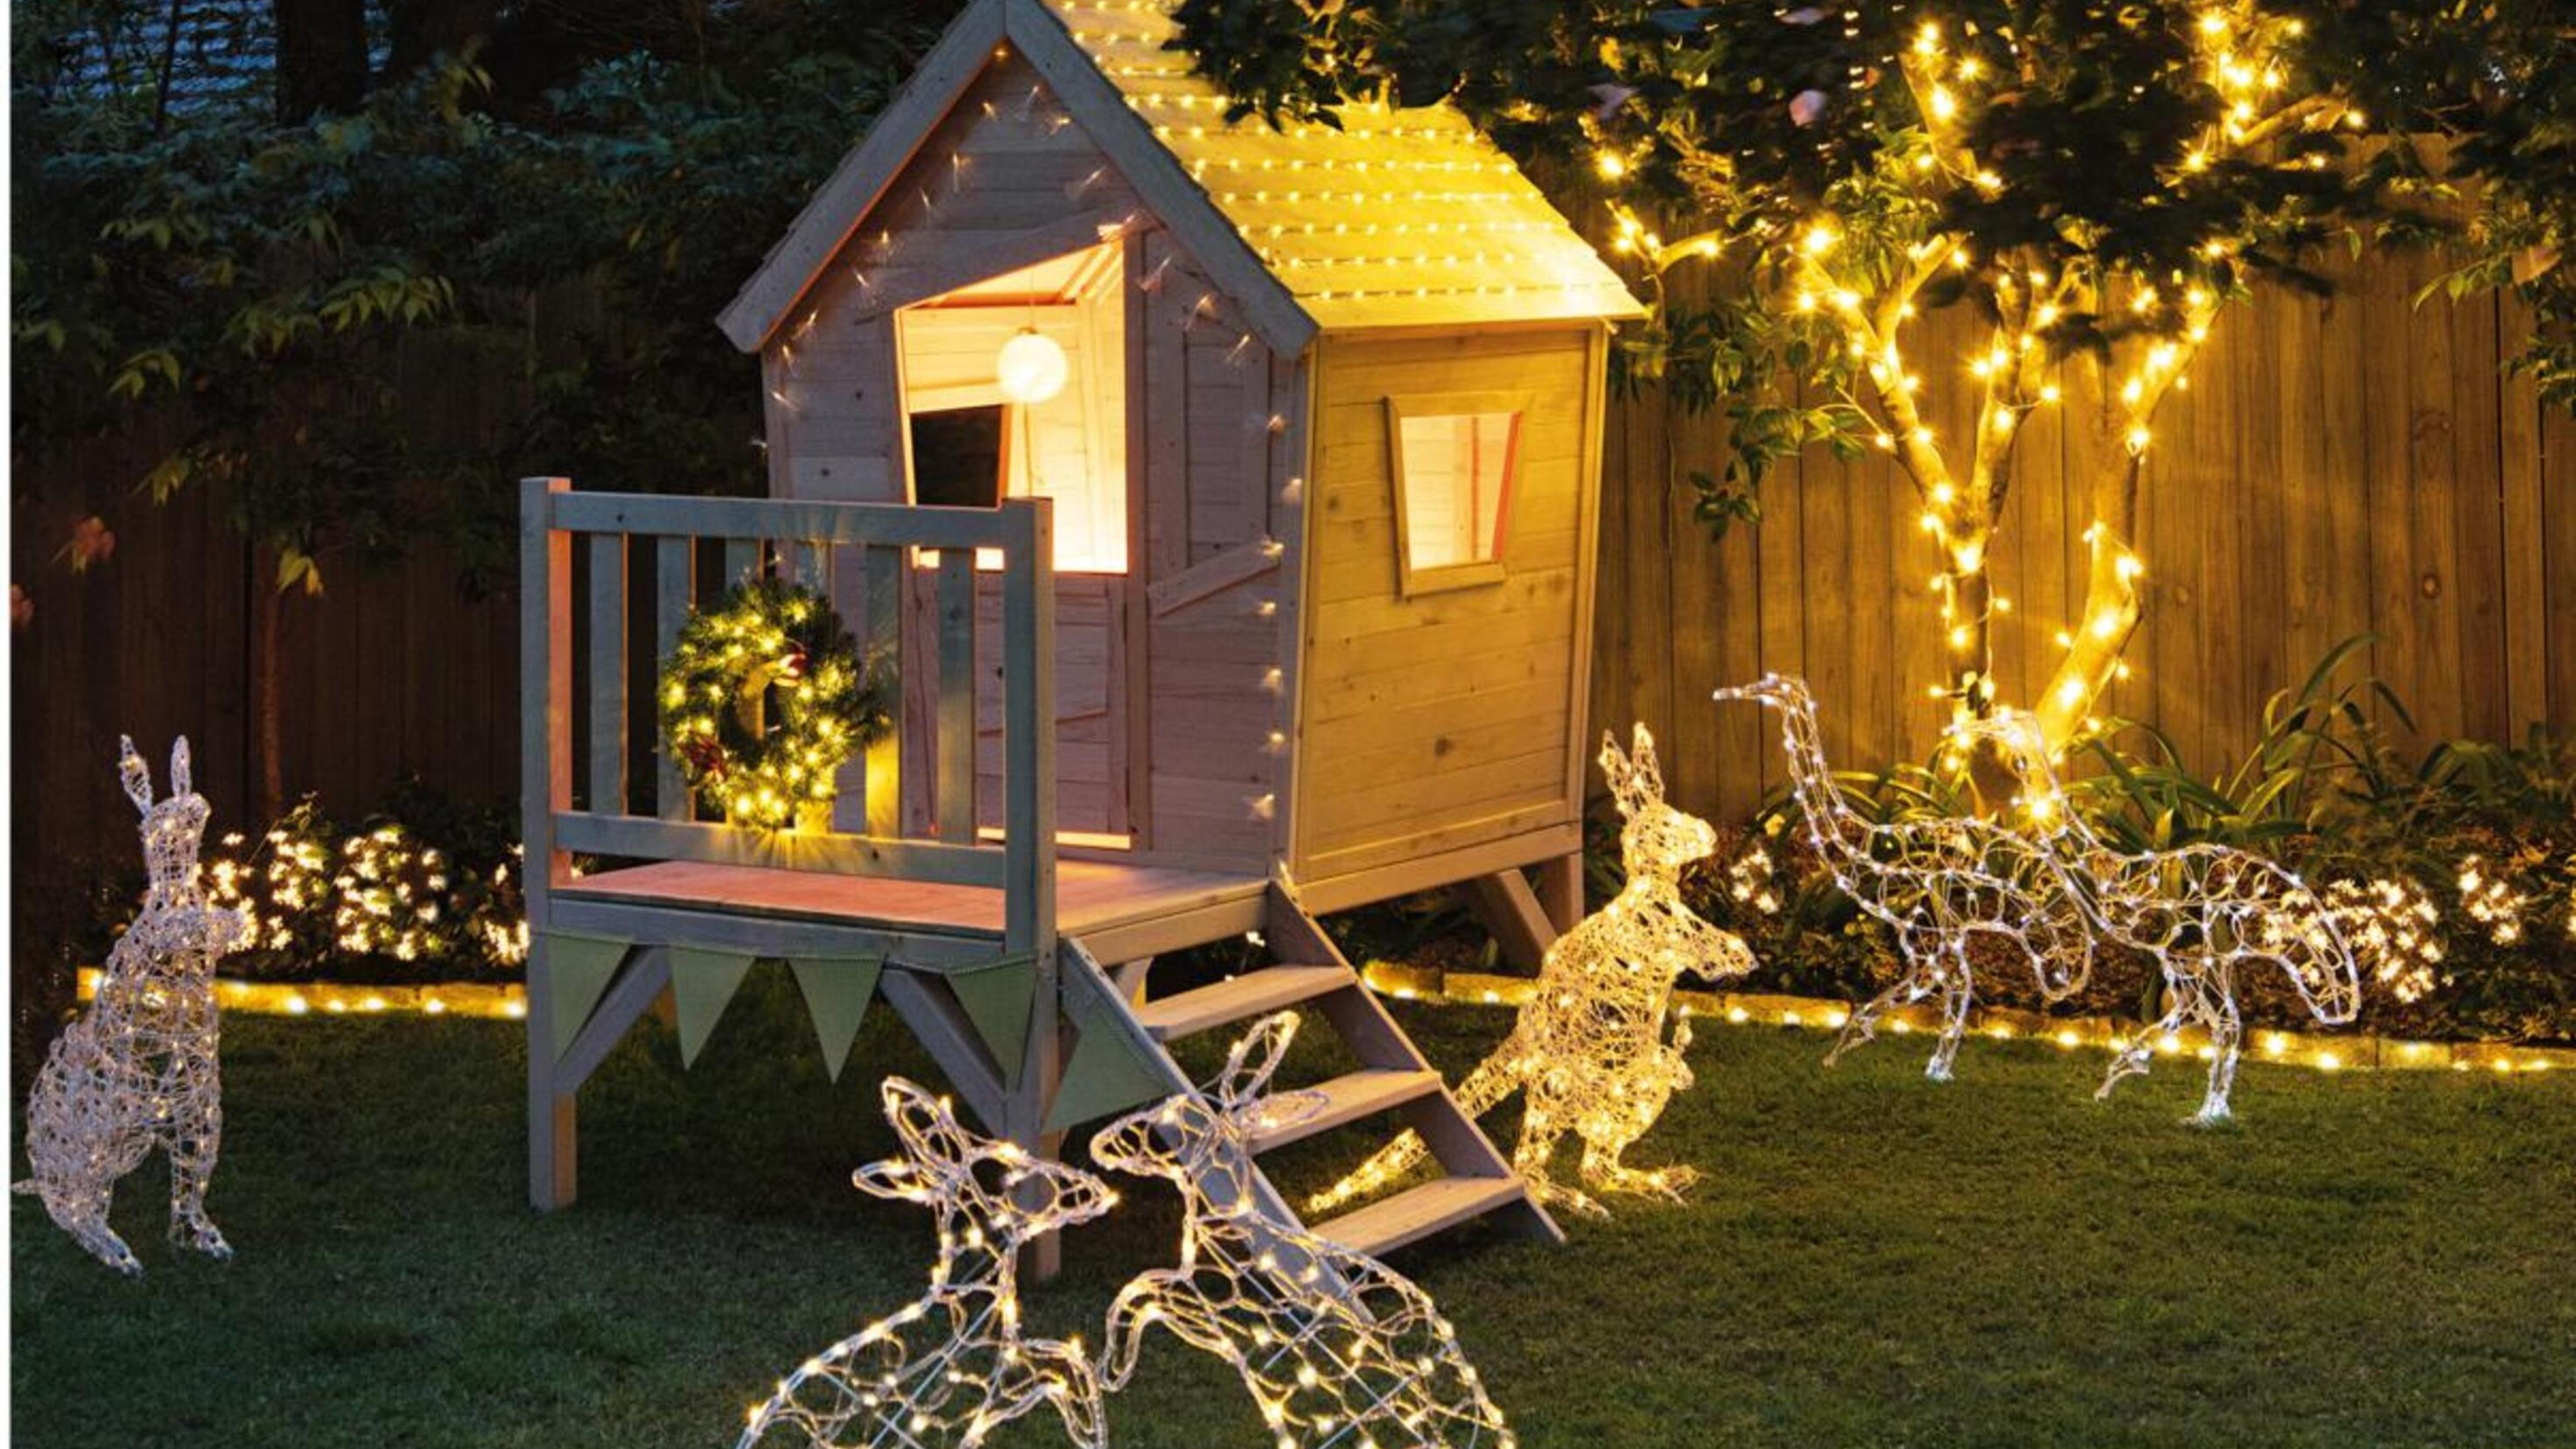 Cubby house with fairy lights.